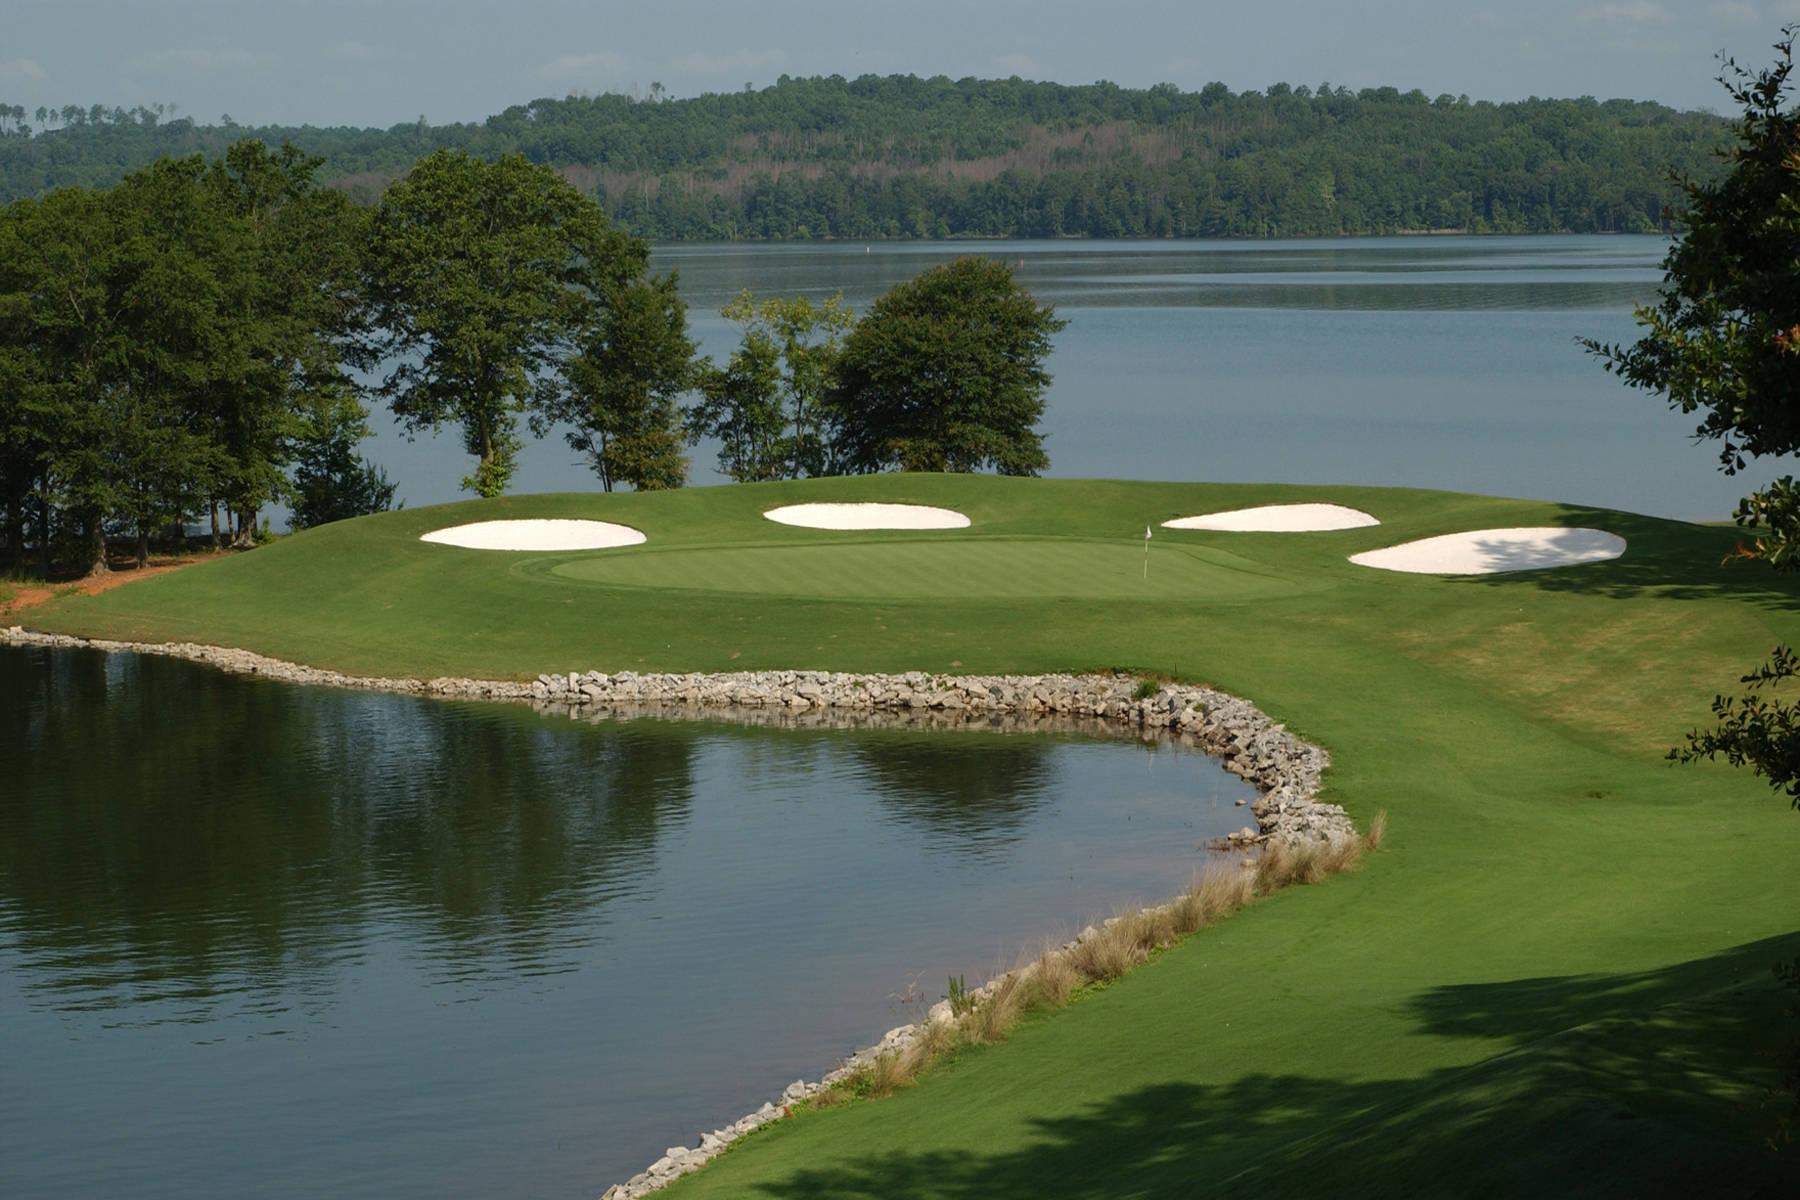 Walker Course Ranked No. 11 by Golfweek